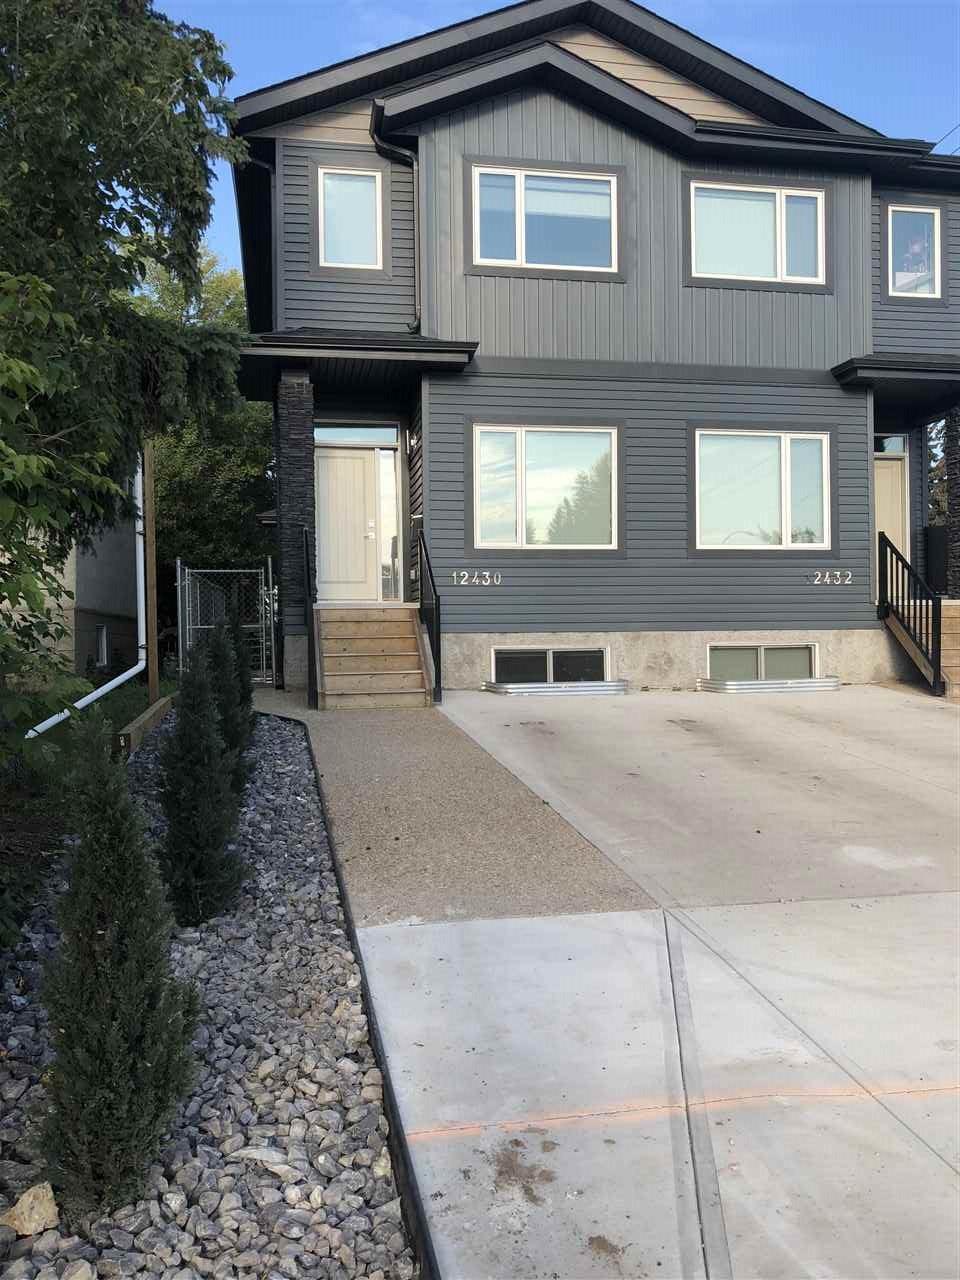 12430 125 Street NW, 4 bed, 4 bath, at $424,900